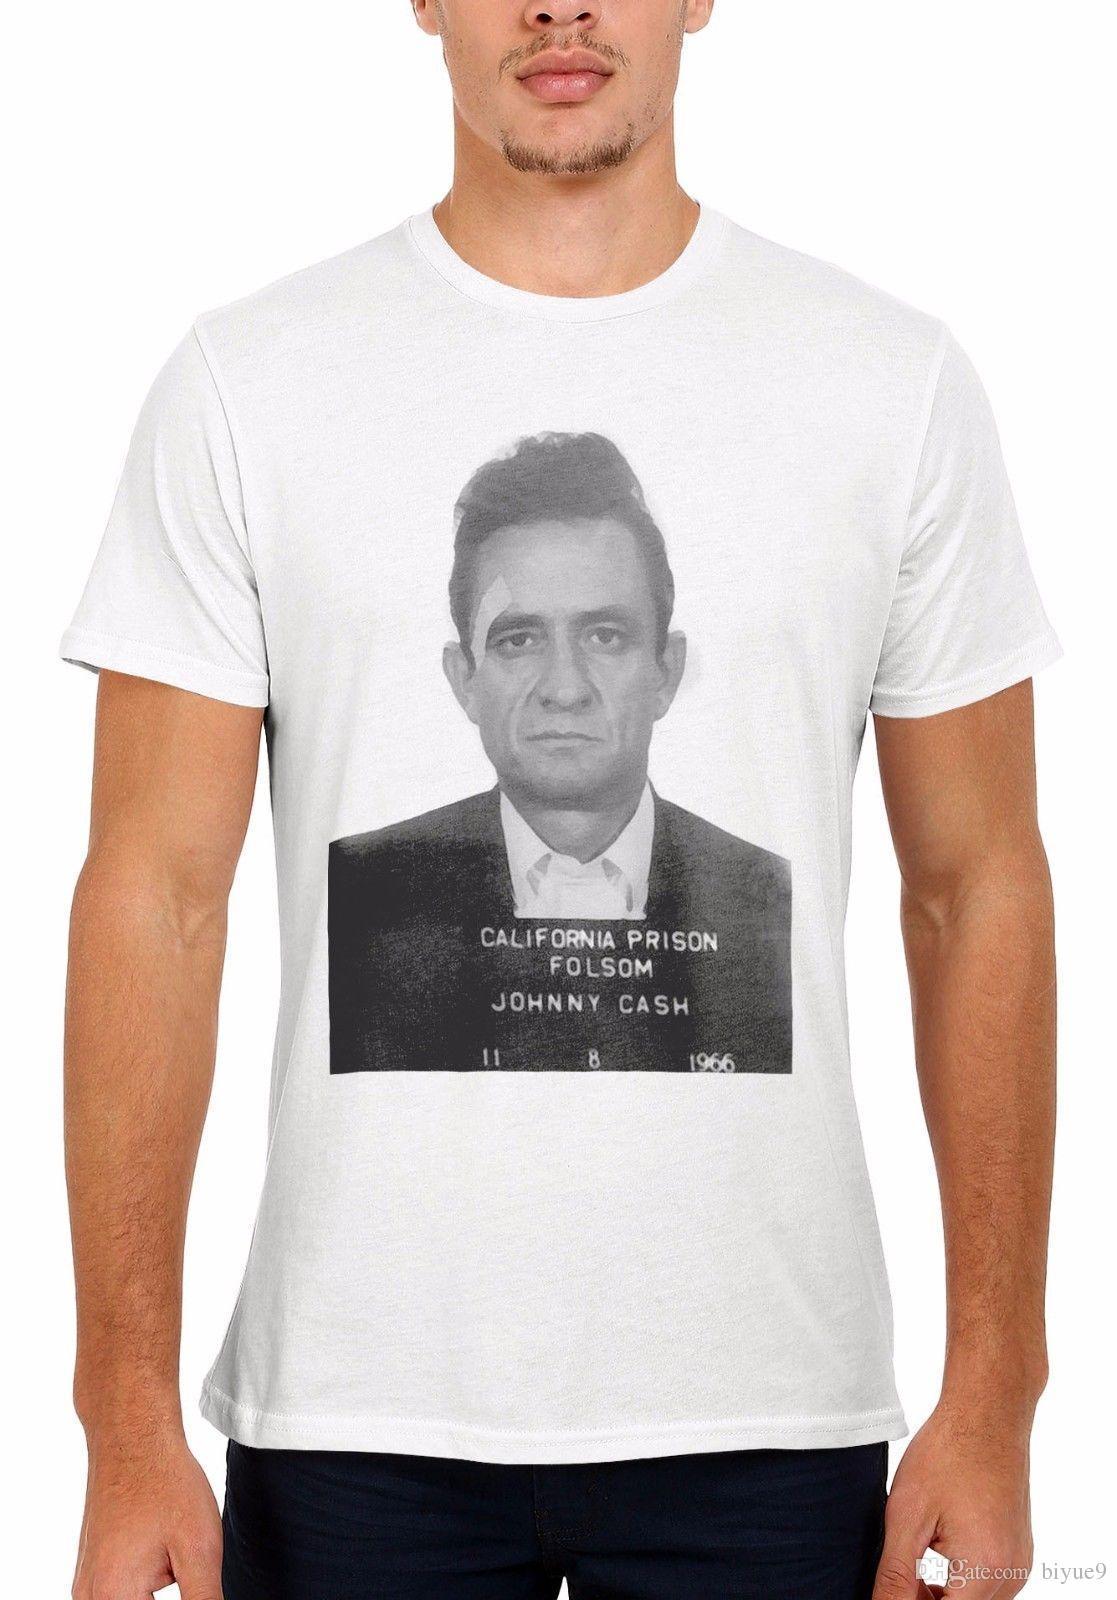 7a80bd08f03e89 Johnny Cash Mugshot Men Women Vest Tank Top Unisex T Shirt 2039 Short  Sleeve Round Neck T Shirt Promotion Funny Vintage T Shirts T Shirts From  Biyue9